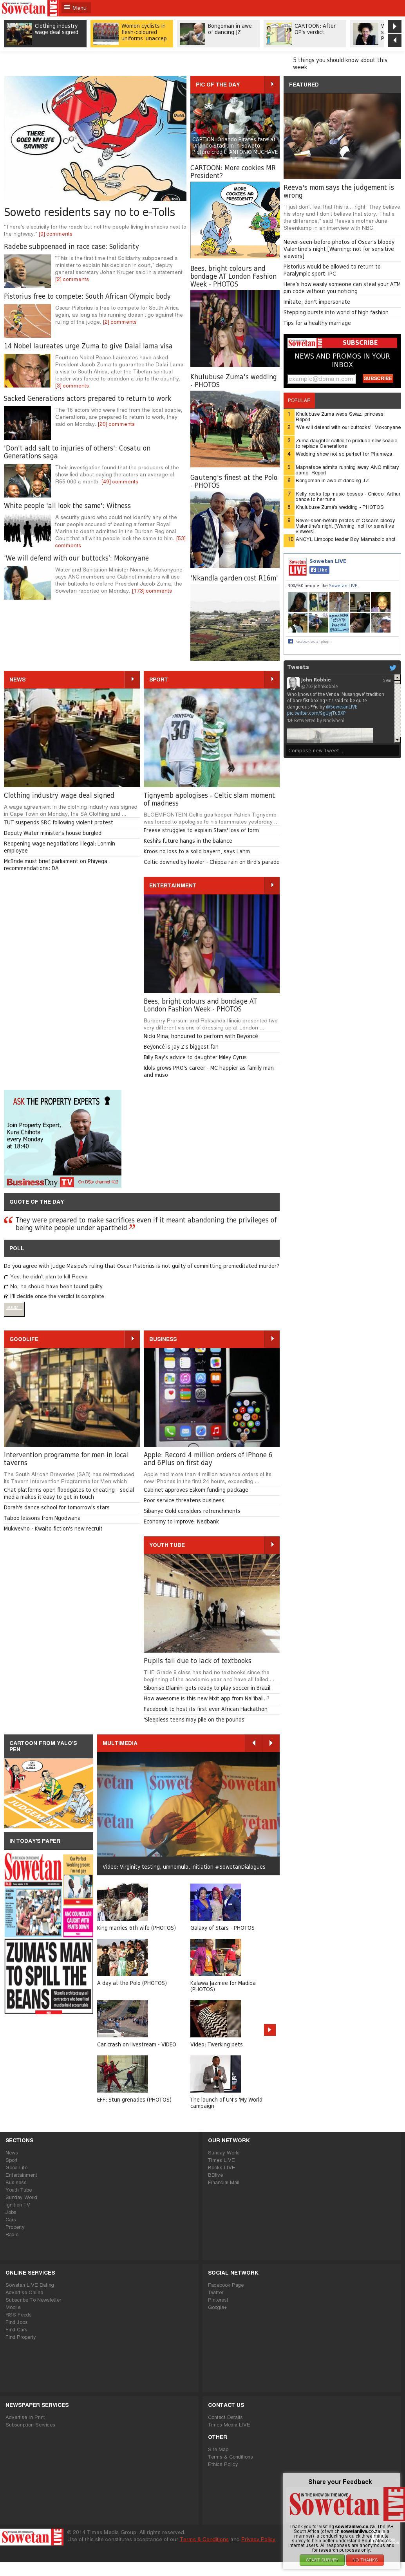 Sowetan Live at Tuesday Sept. 16, 2014, 5:16 a.m. UTC